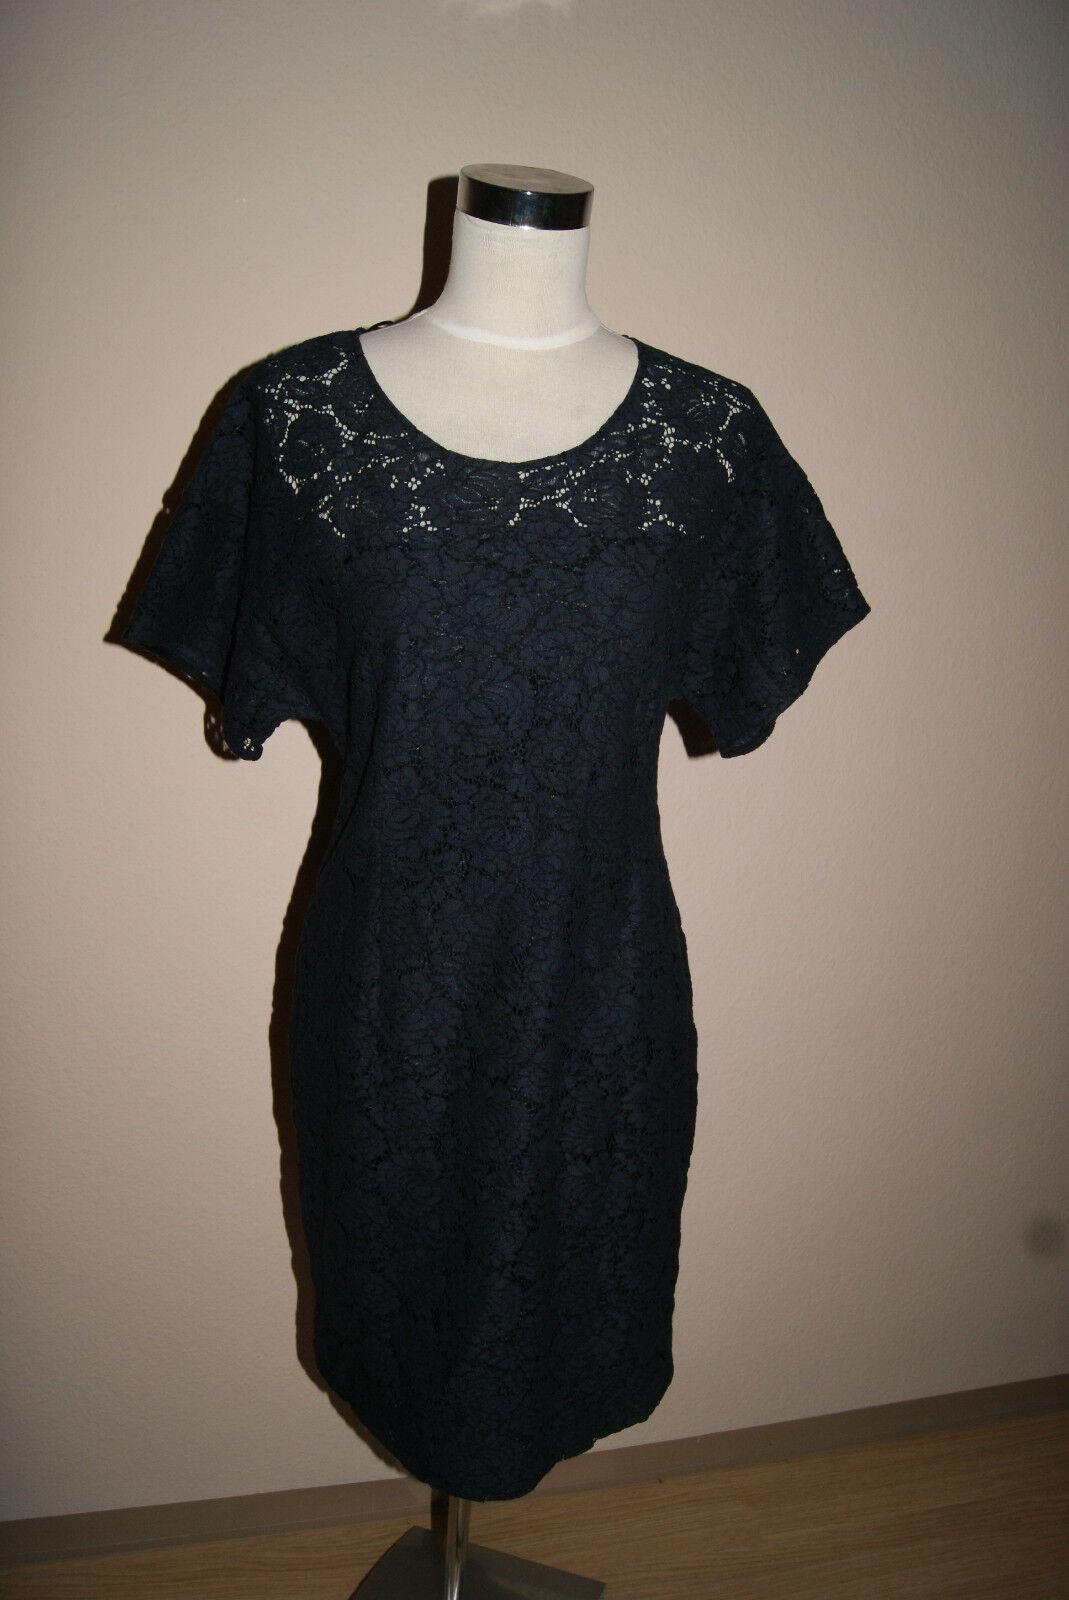 SET Kleid Gr. 40  OUISET Oui blau dunkelblau Abendkleid Spitzenkleid Spitze NEU